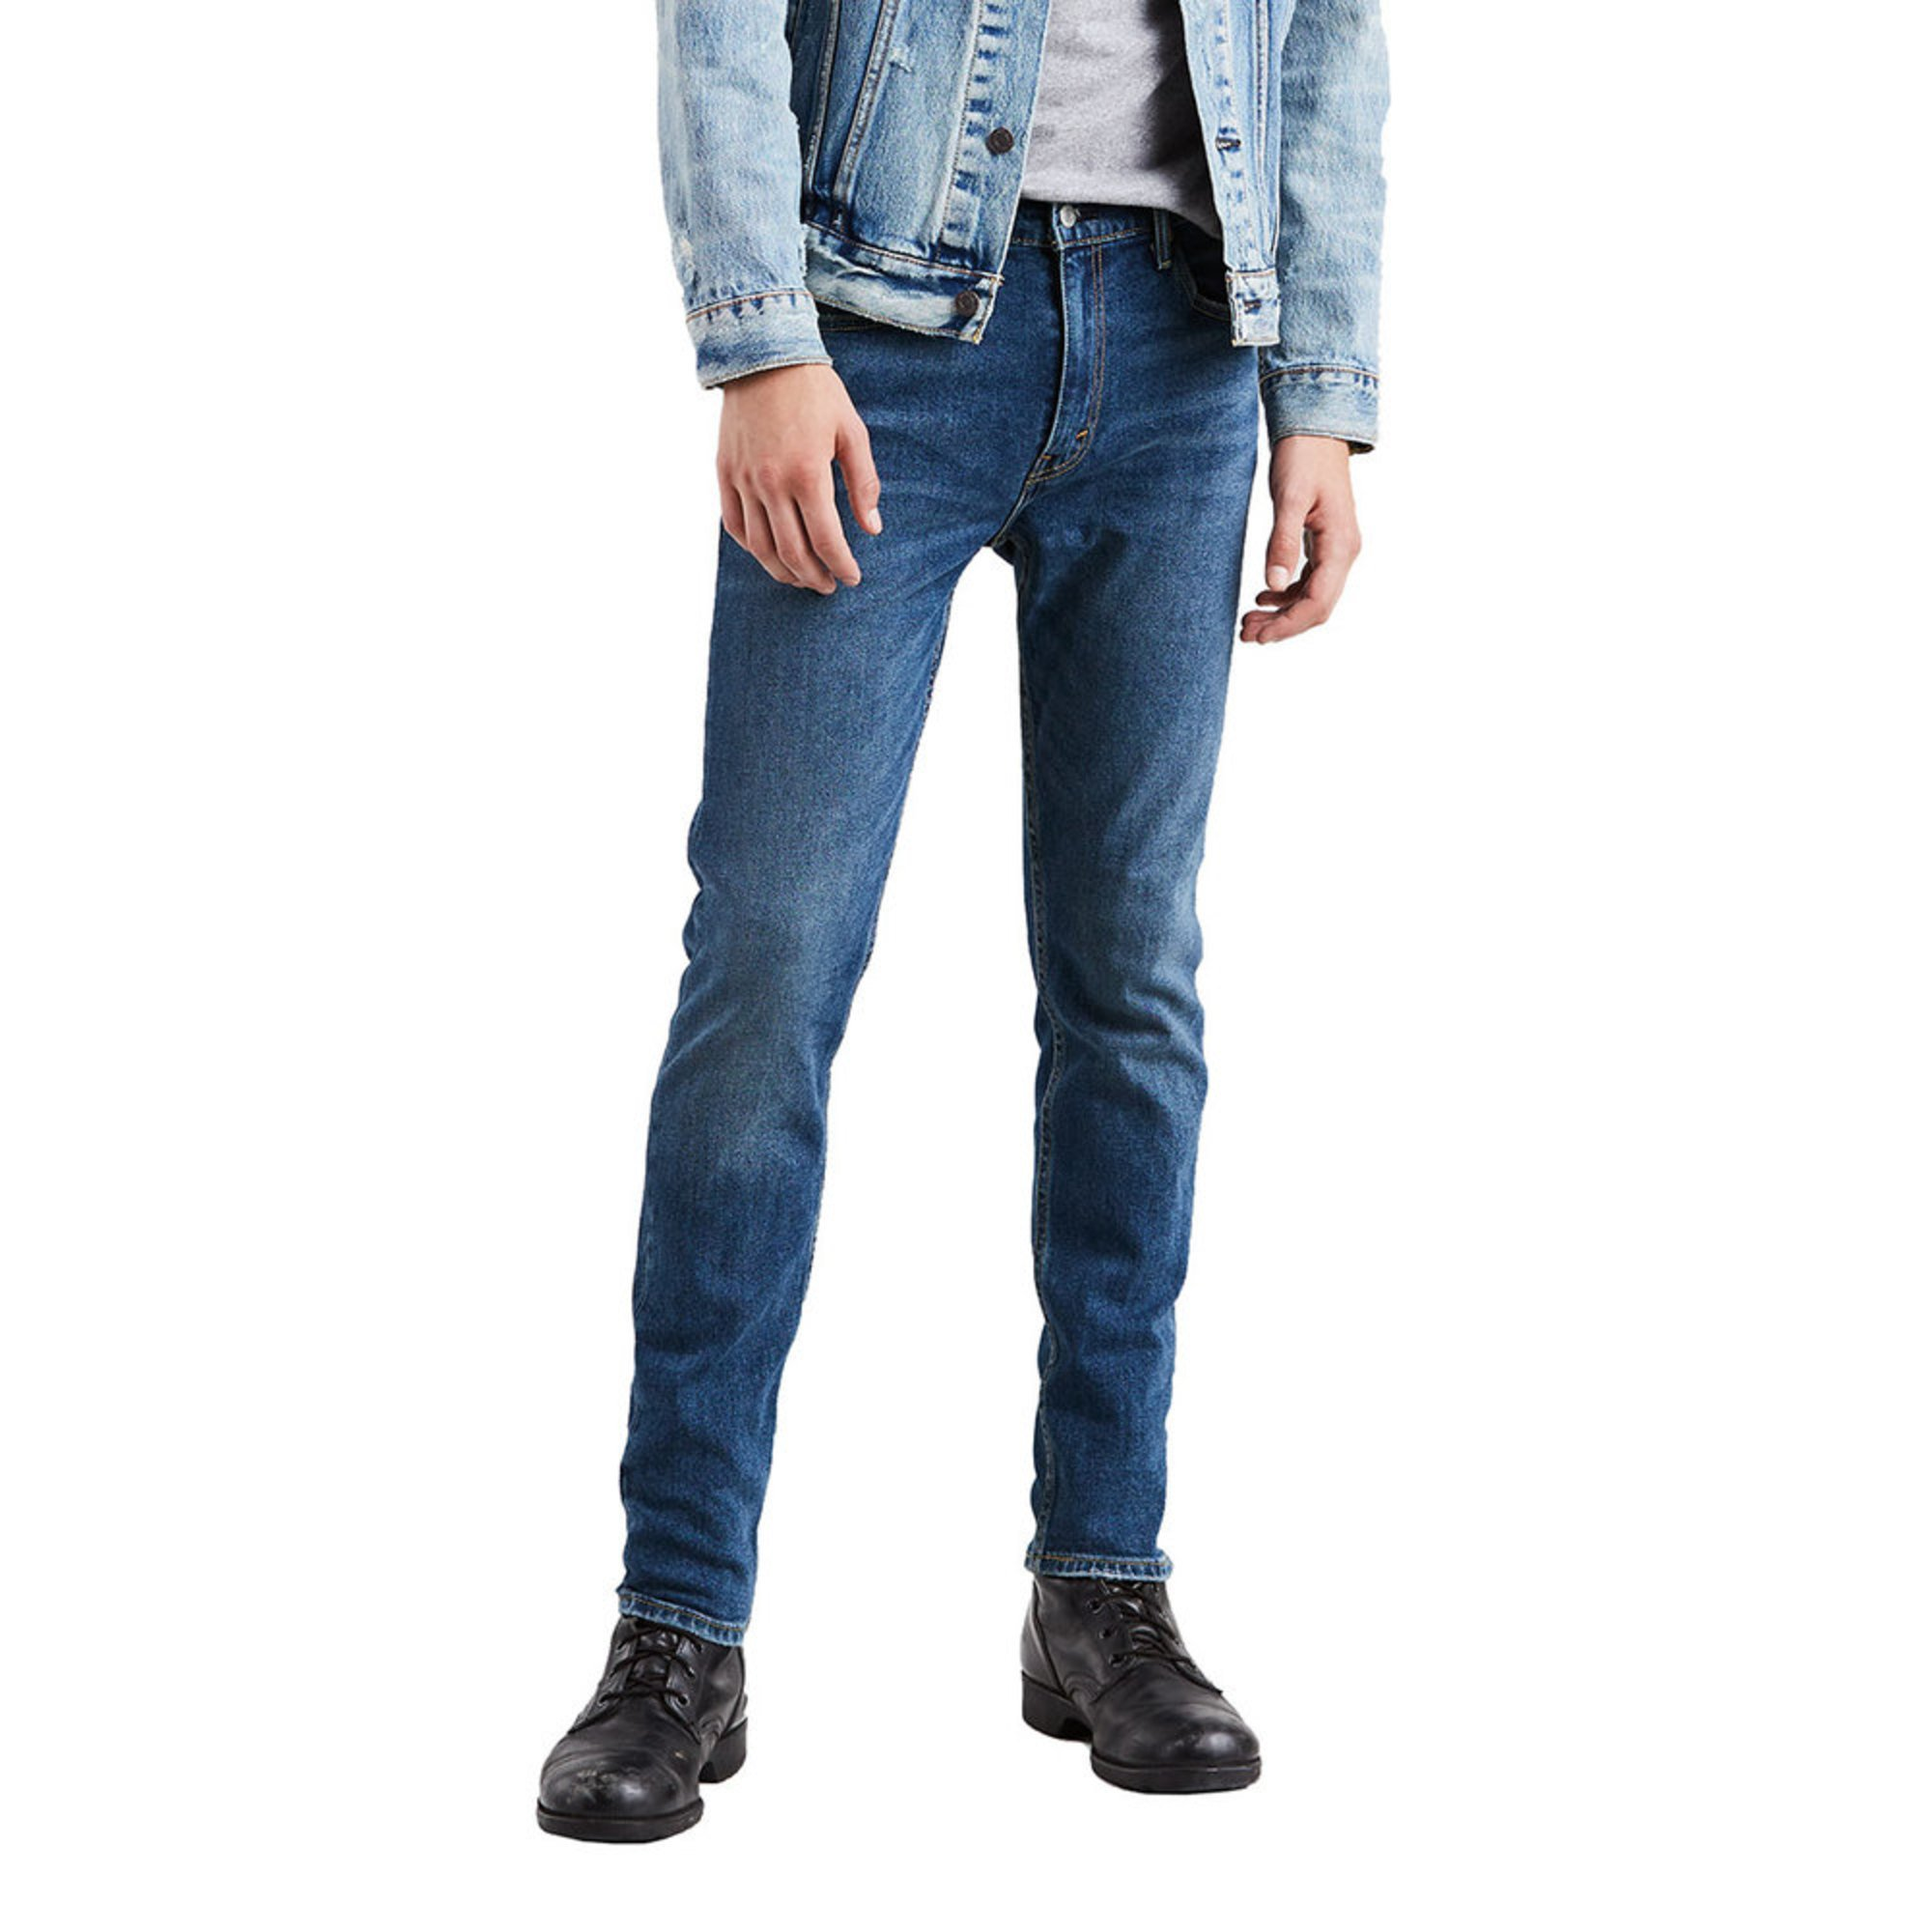 703c59e2ca1 Sep Levi 512 Slim Taper Denim Jean | Men's Jeans | Apparel - Shop ...